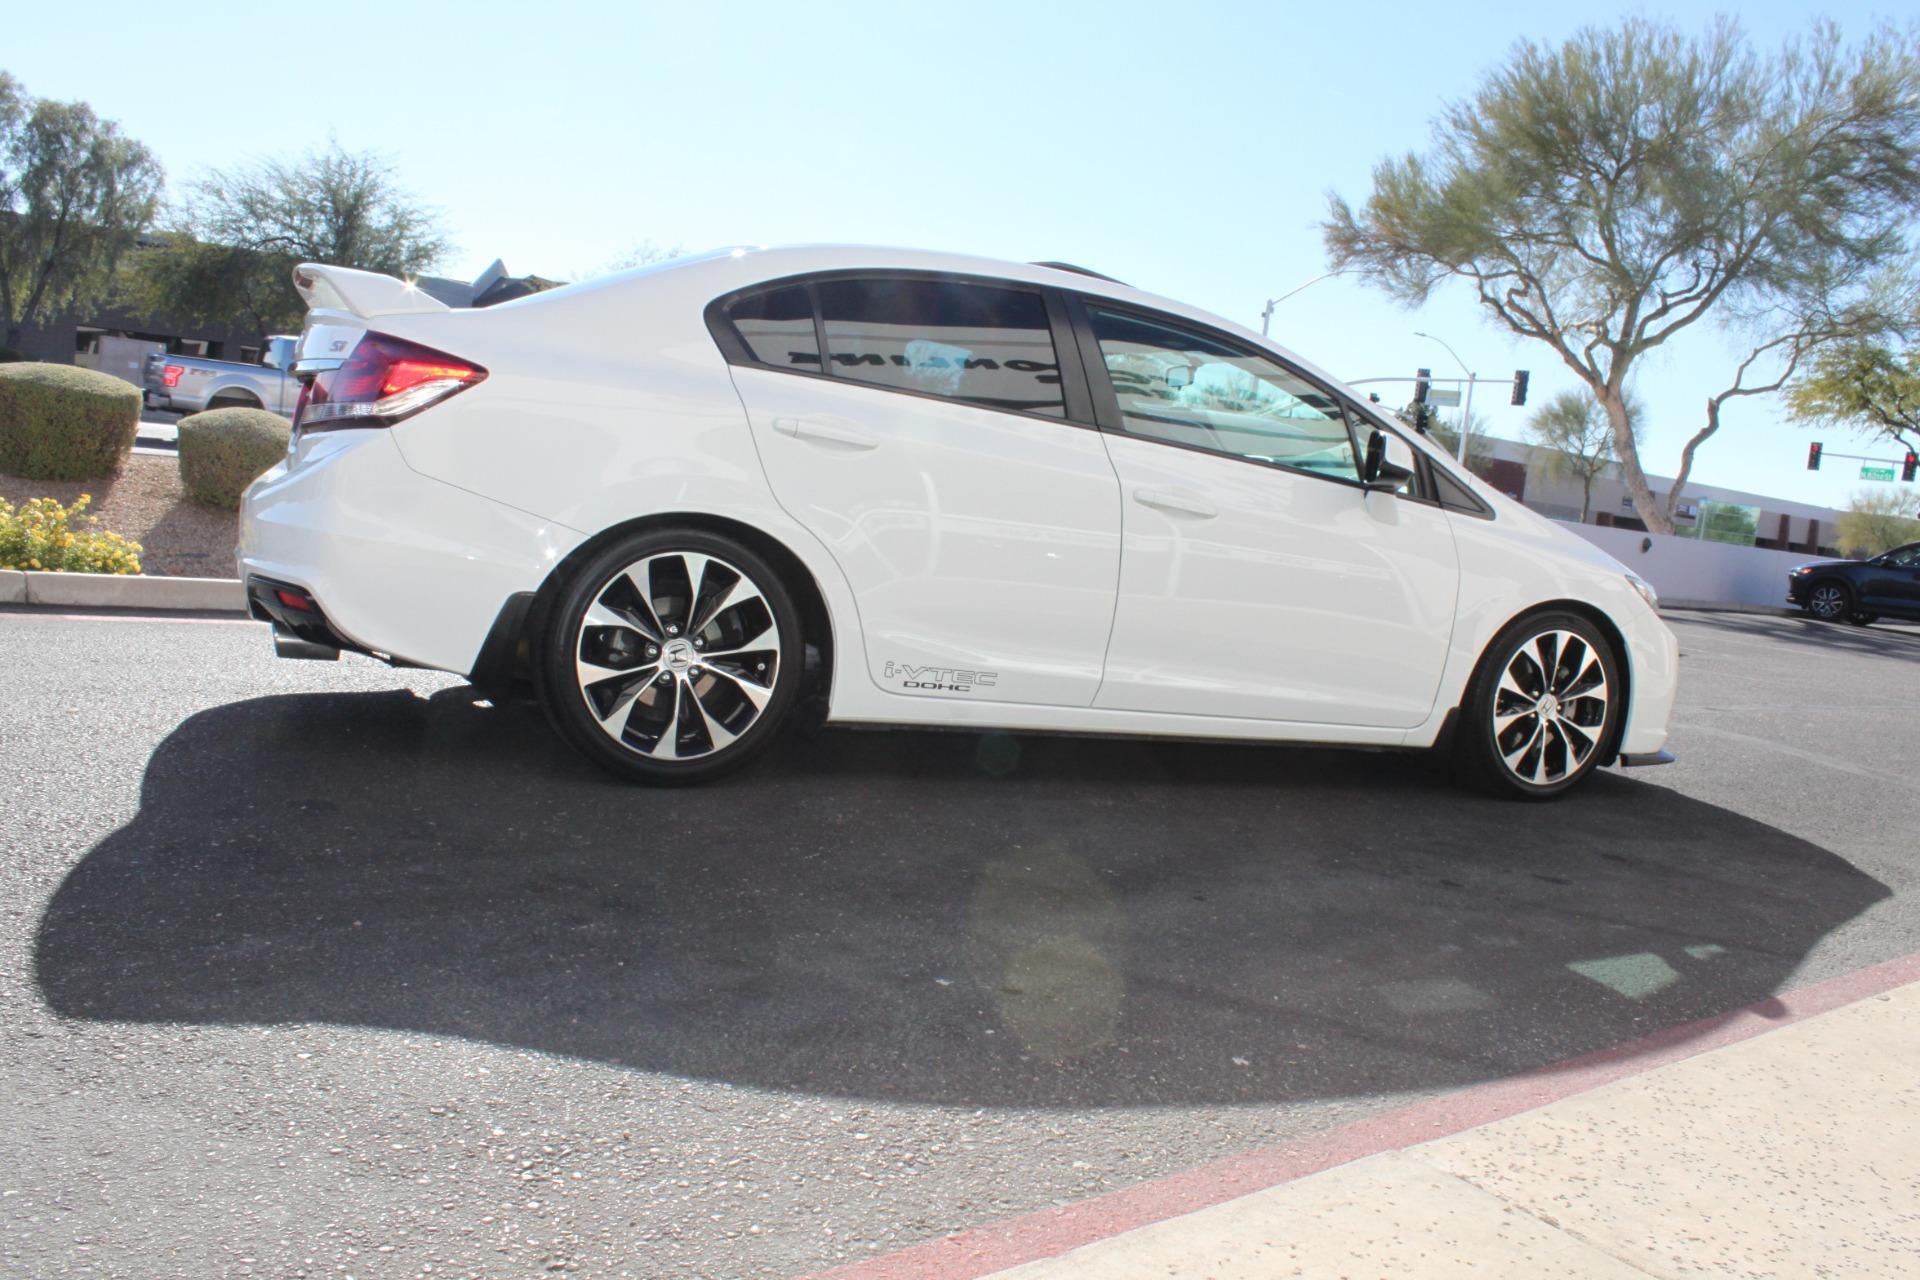 Used-2013-Honda-Civic-Sedan-Si-Dodge